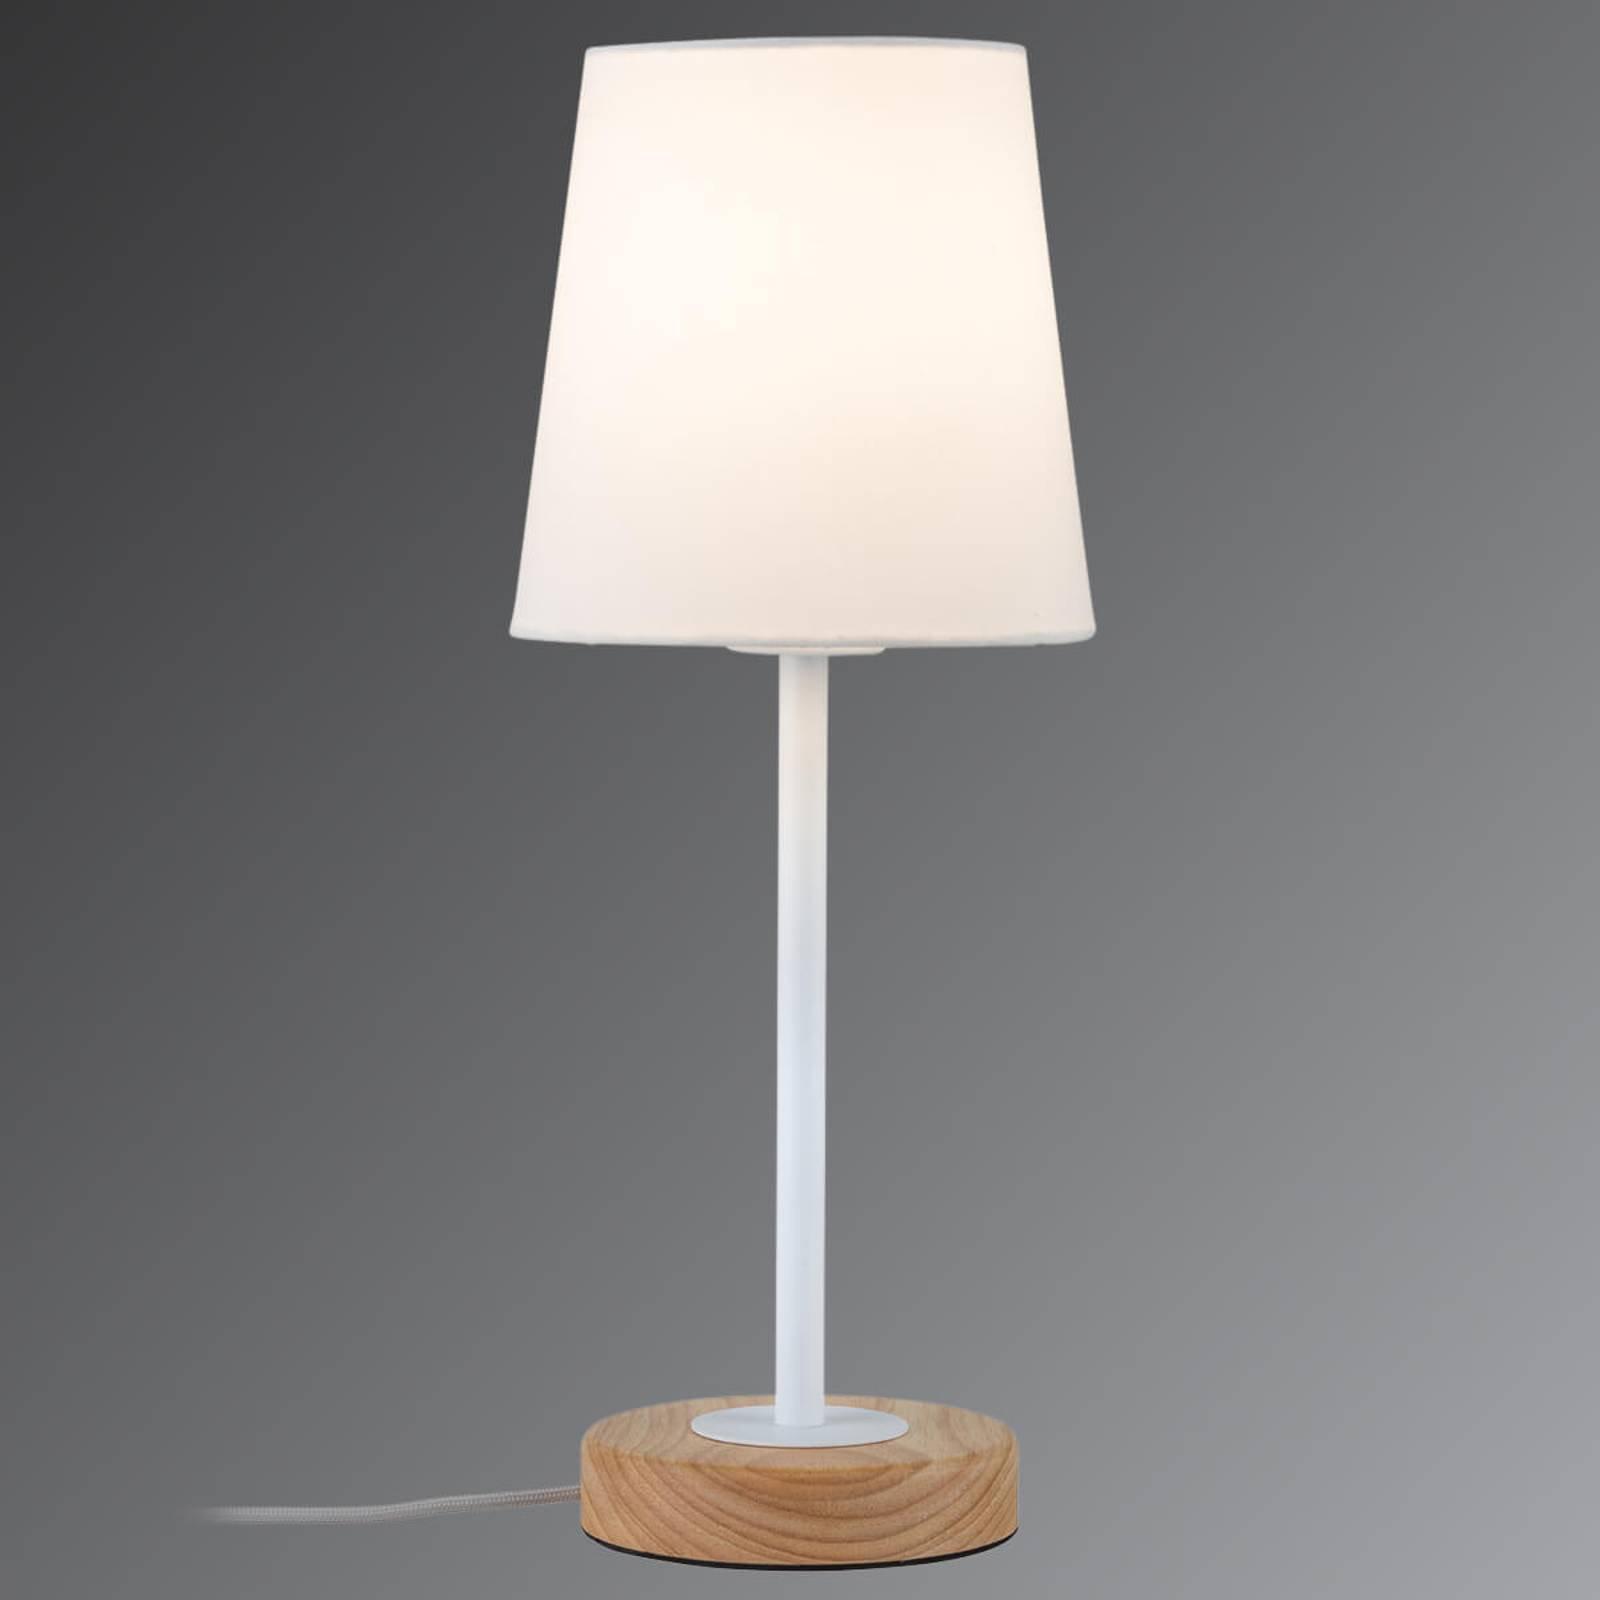 Tekstilbordlampen Stellan i naturlig design